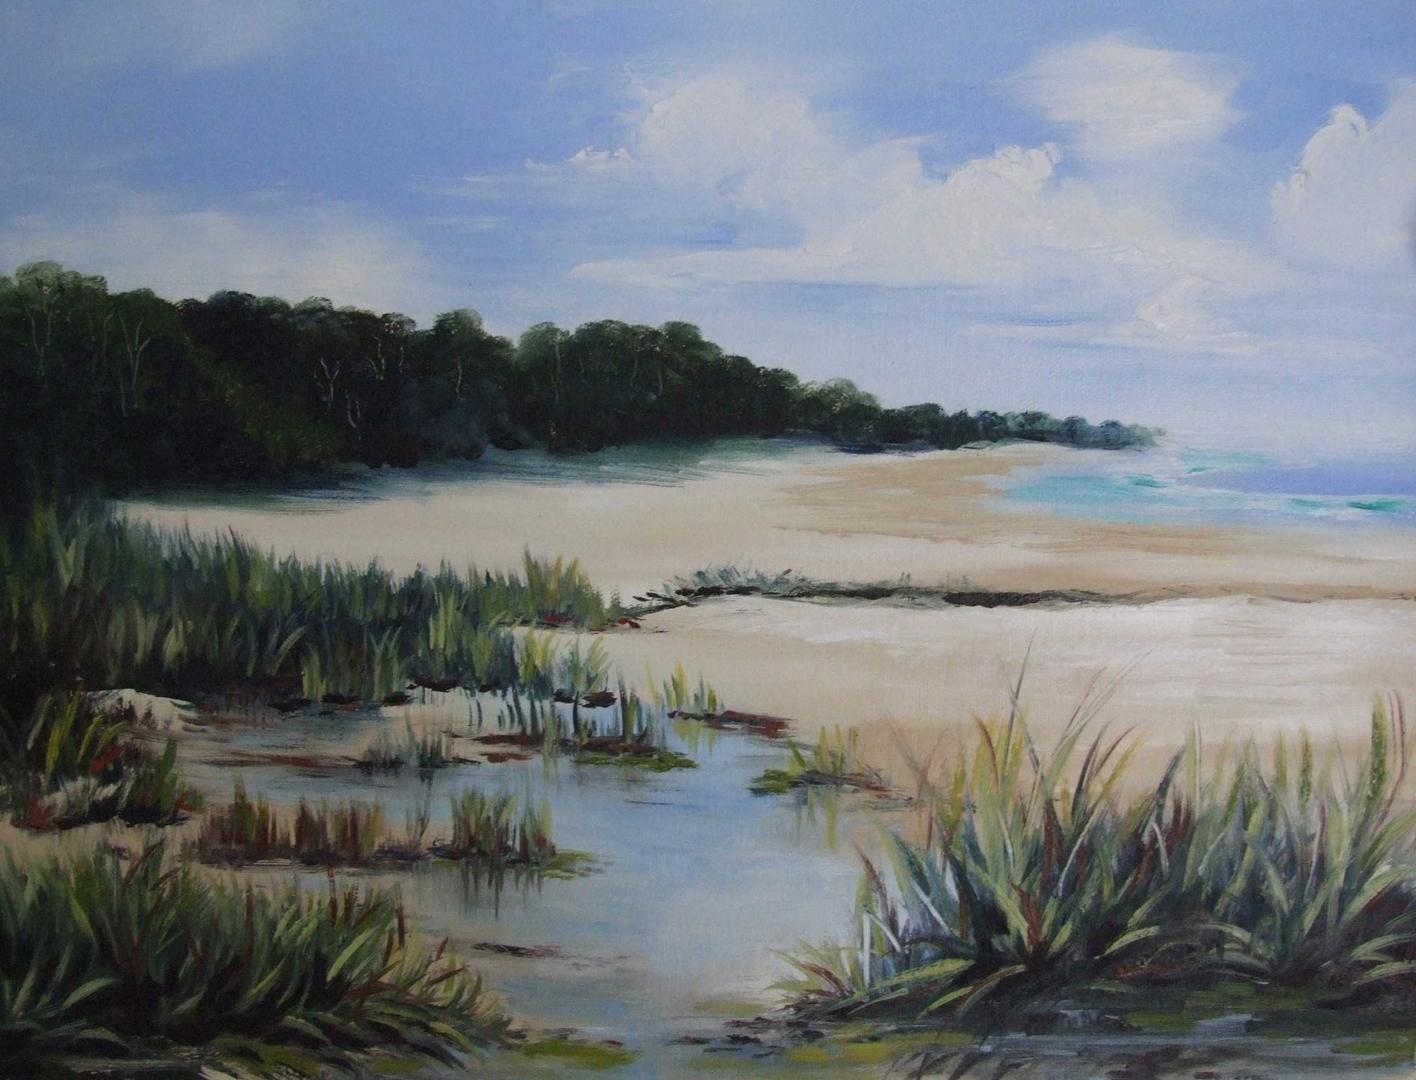 Cylinder Beach image